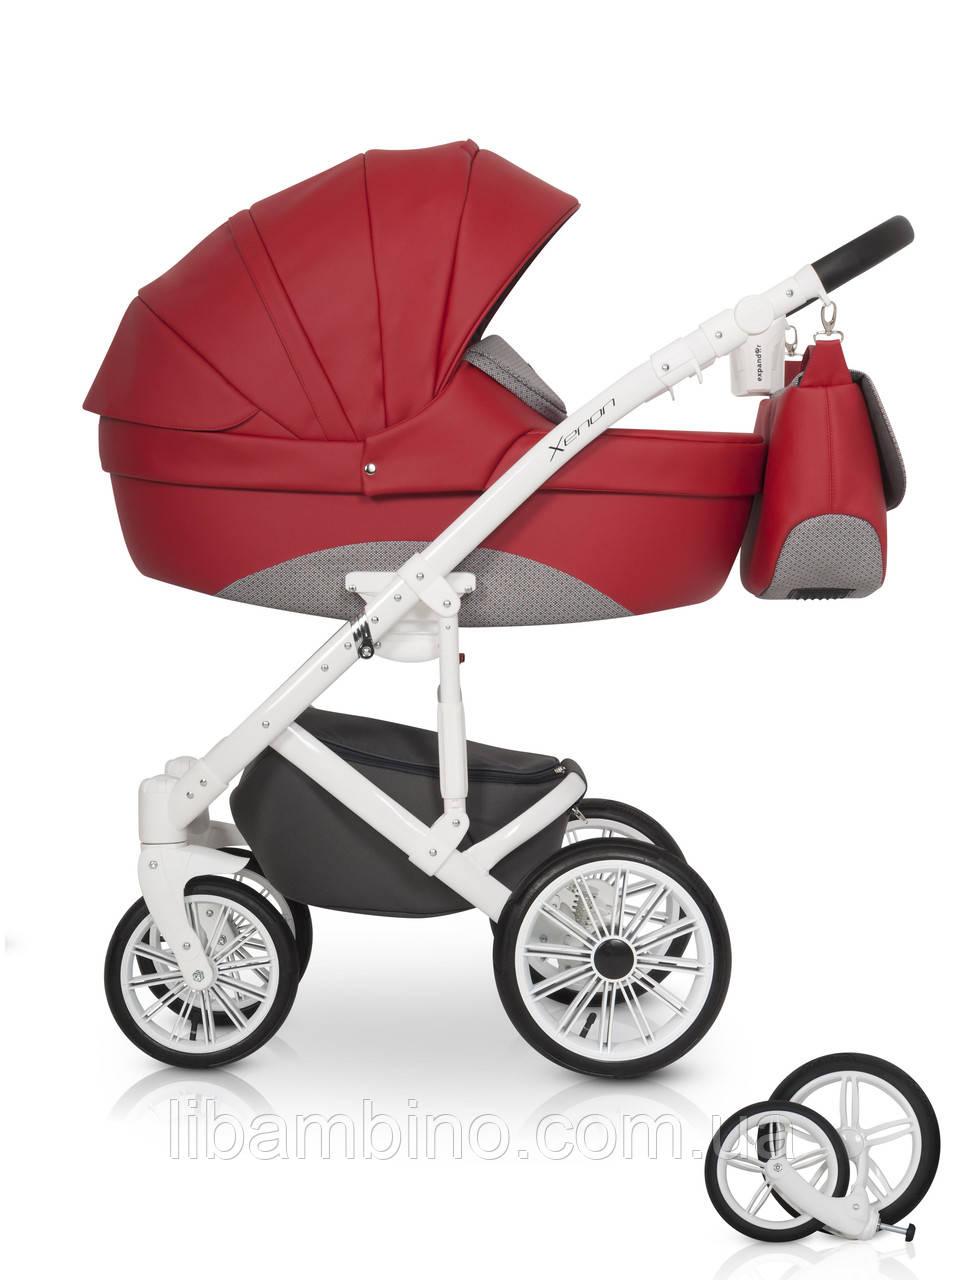 Дитяча універсальна коляска 2 в 1 Expander Xenon 03 Scarlet